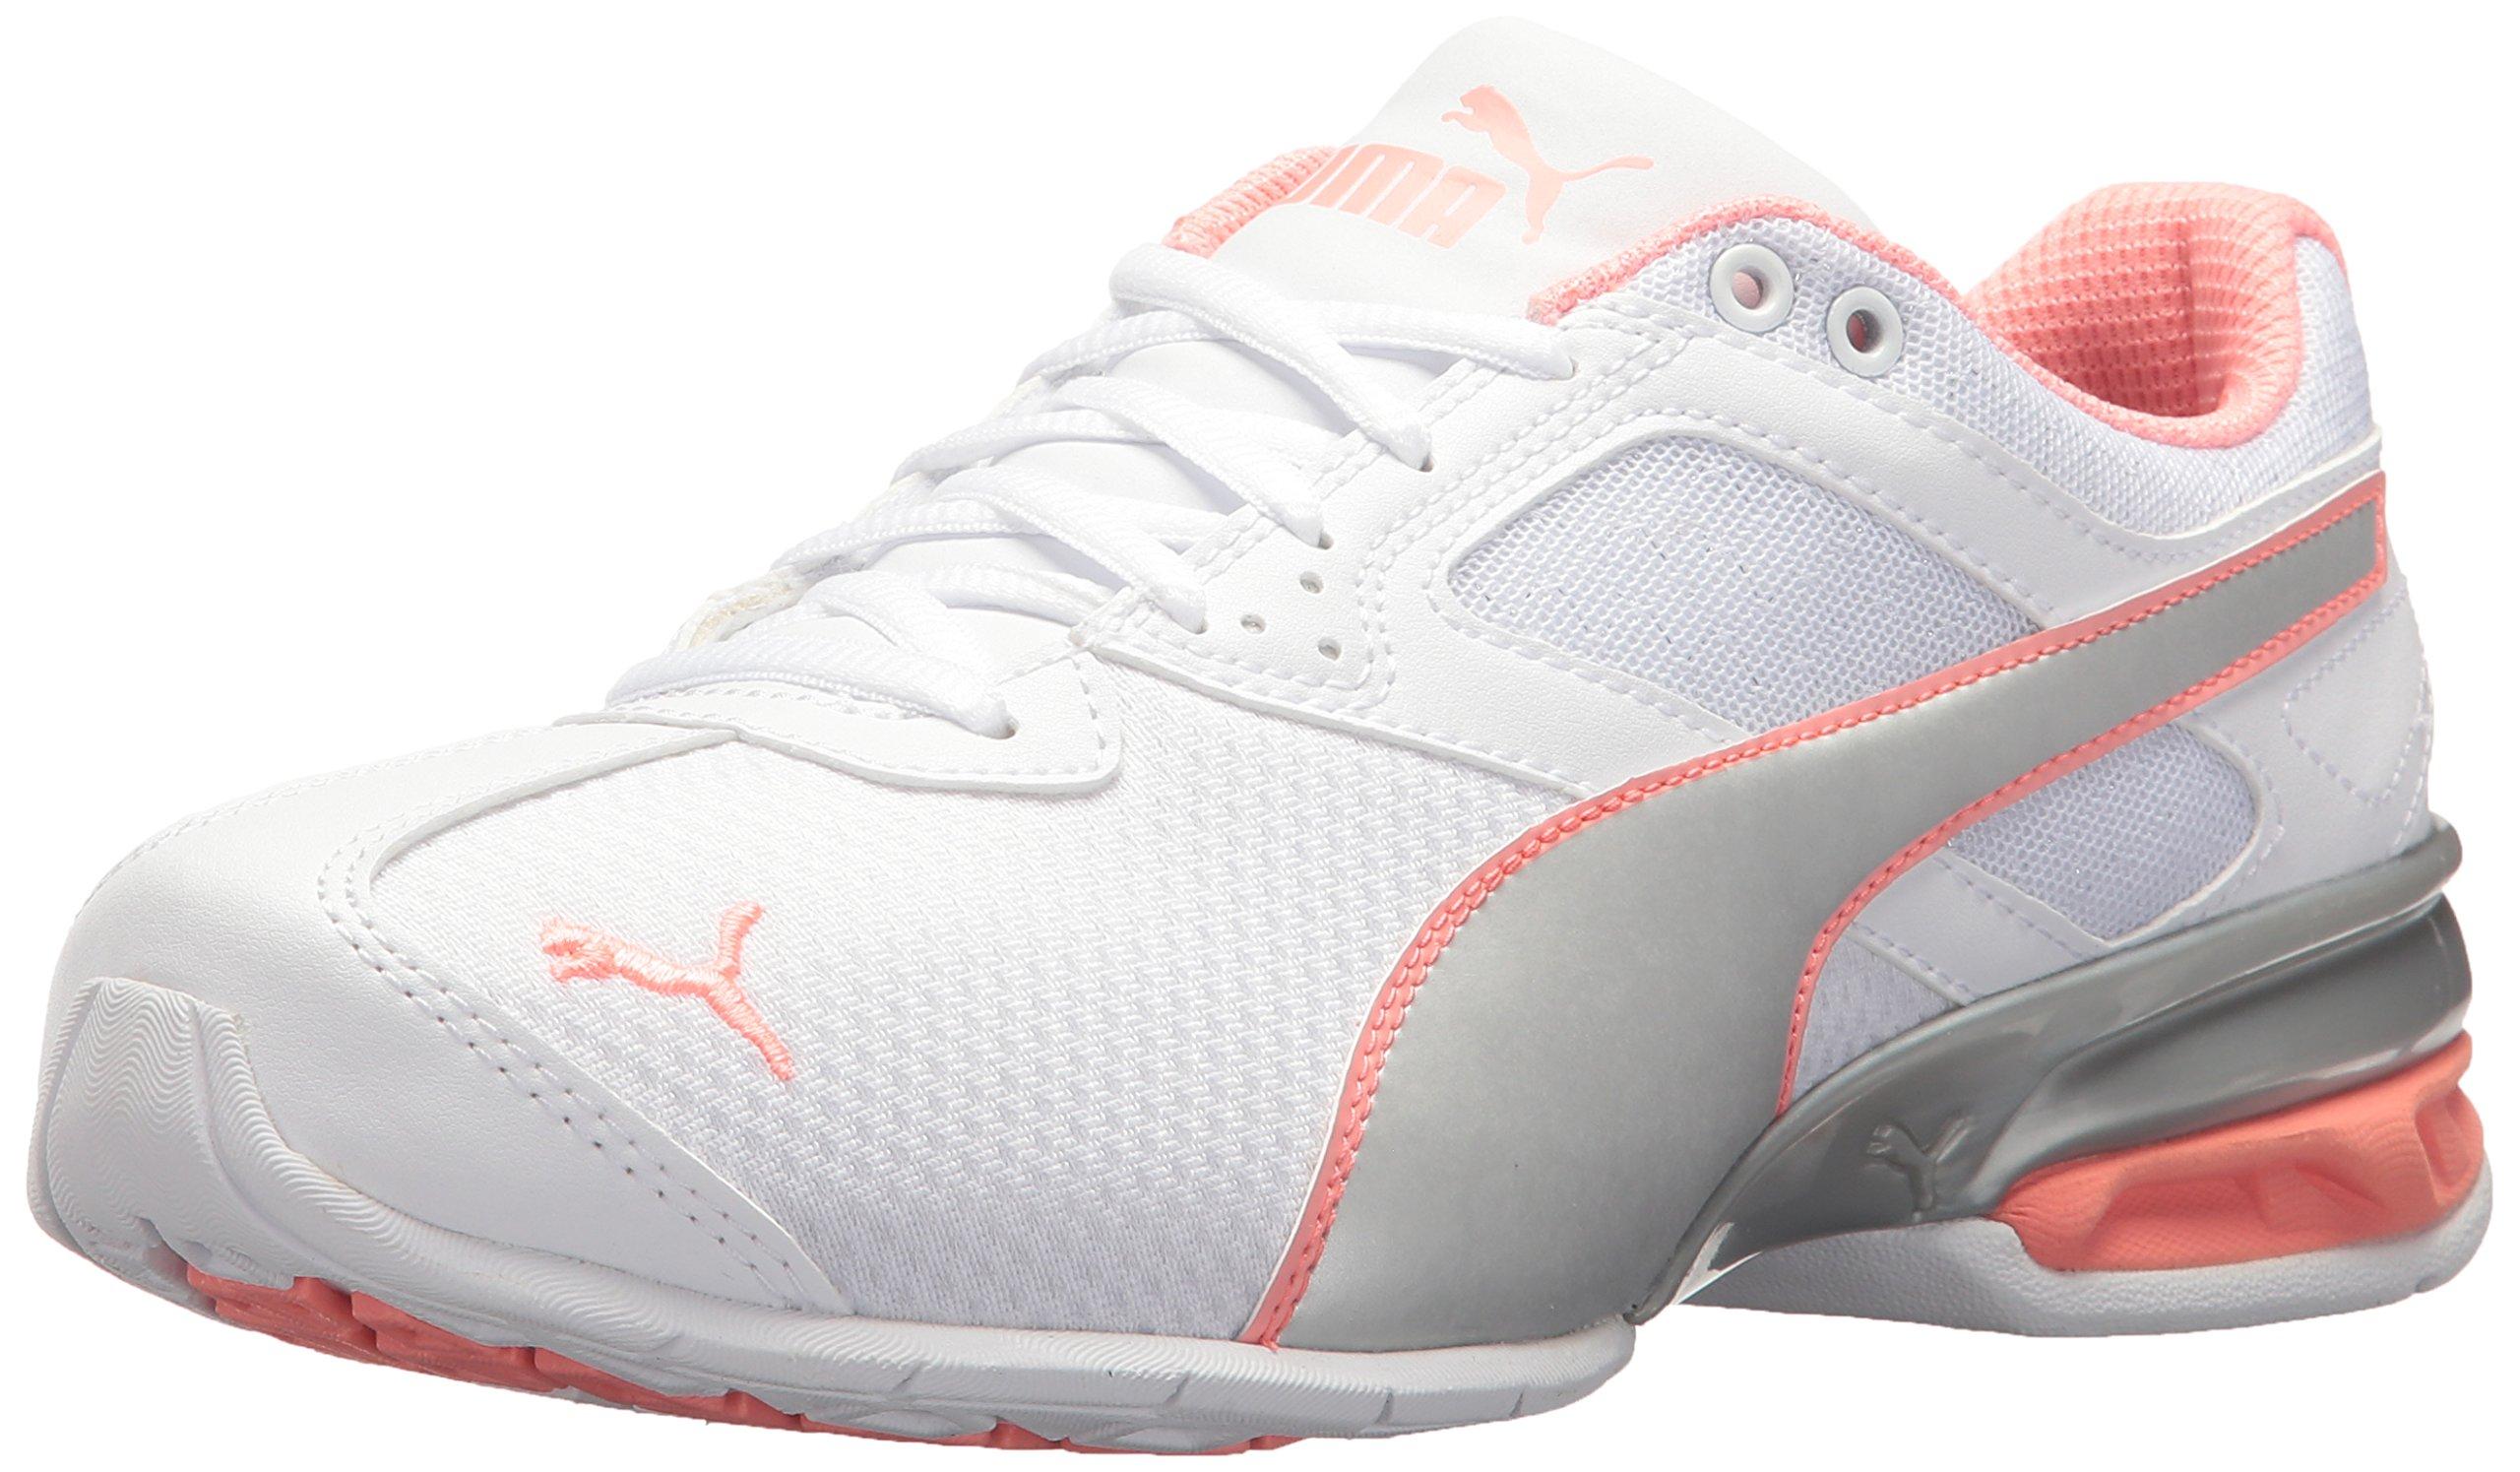 PUMA Women's Tazon 6 Metallic Wn Sneaker, White Silver-Soft Fluo Peach, 8.5 M US